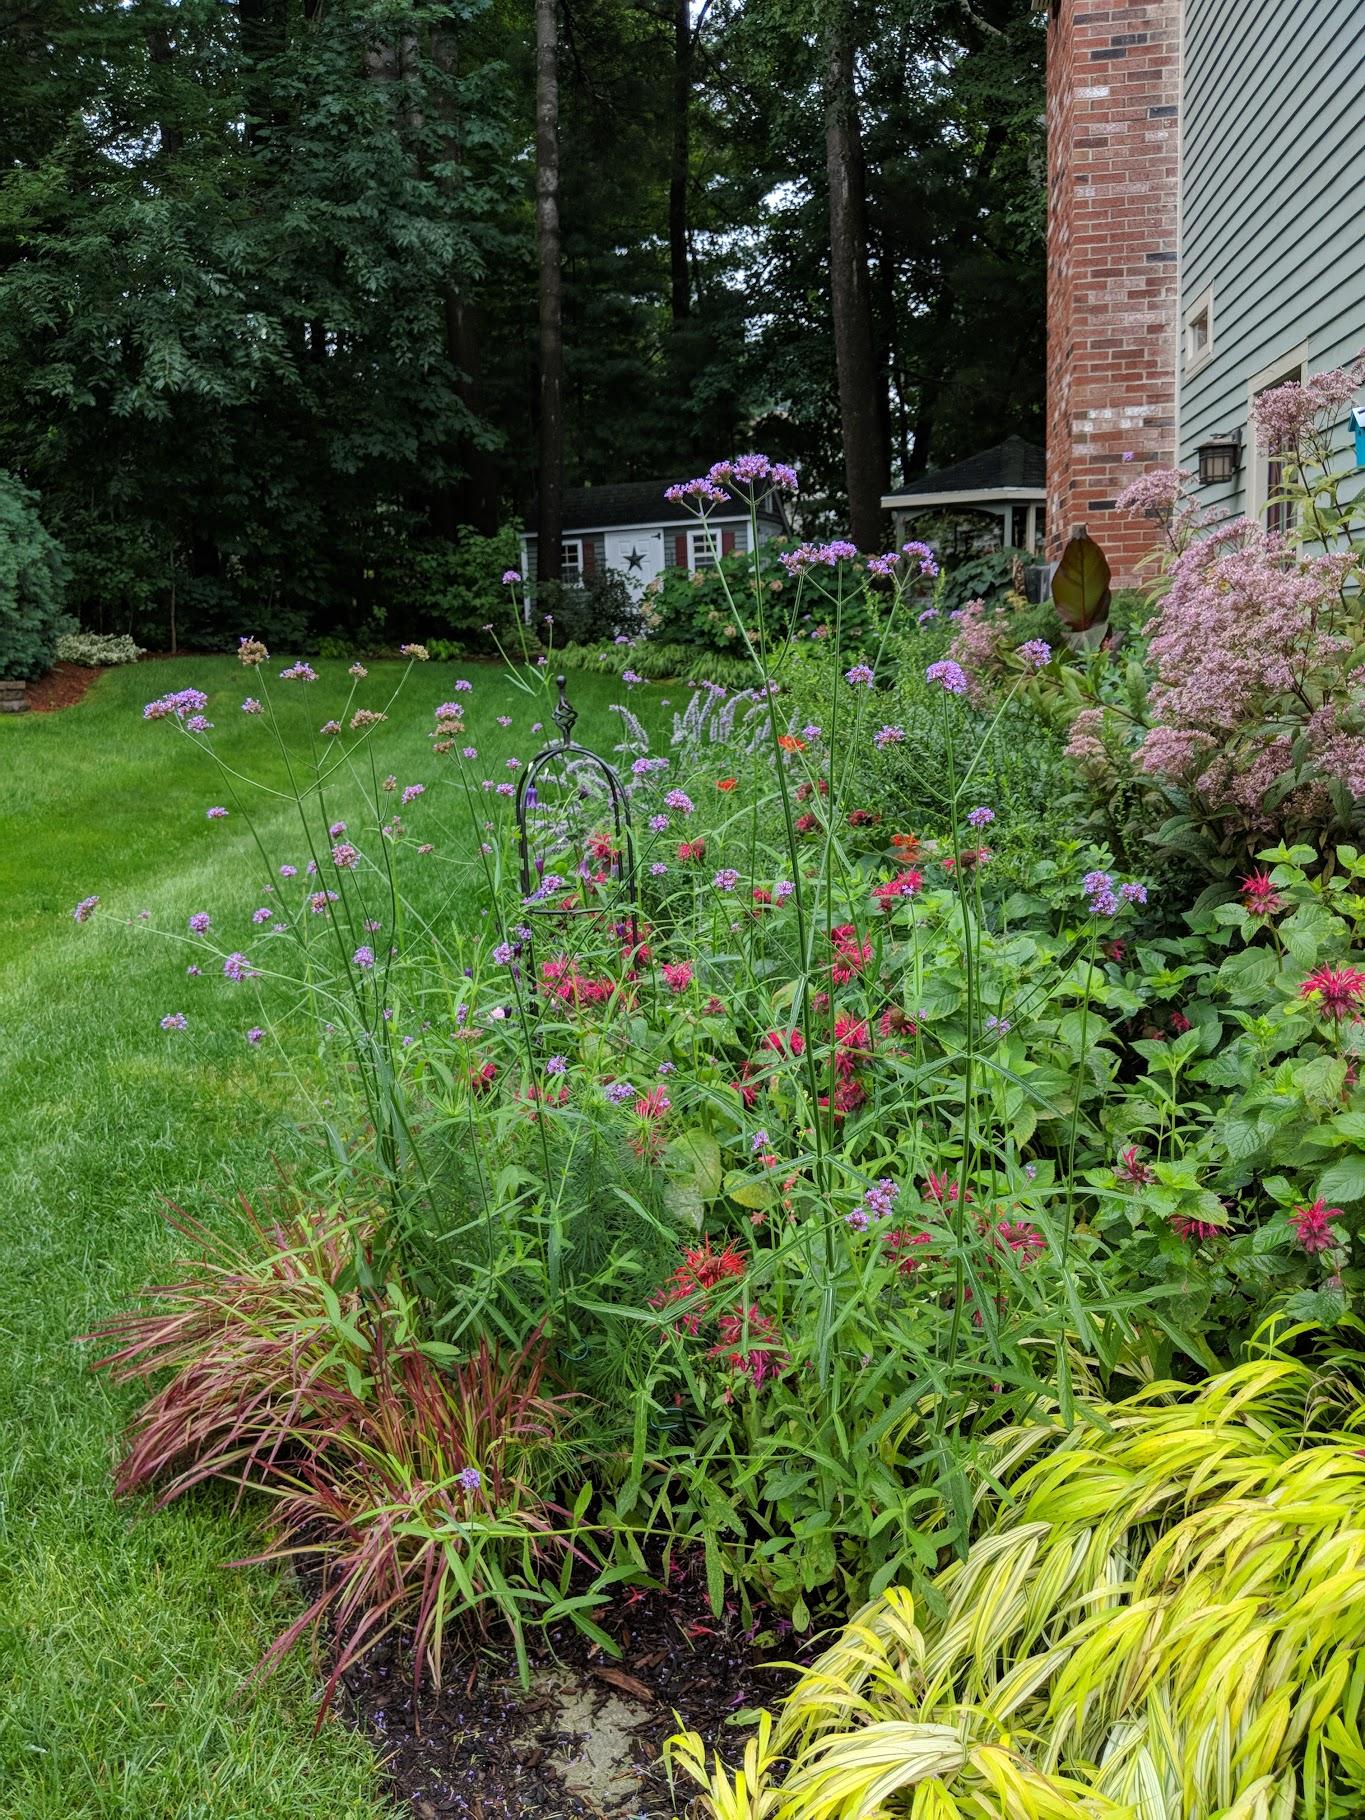 Mid-August and Verbena Bonariensis dominates